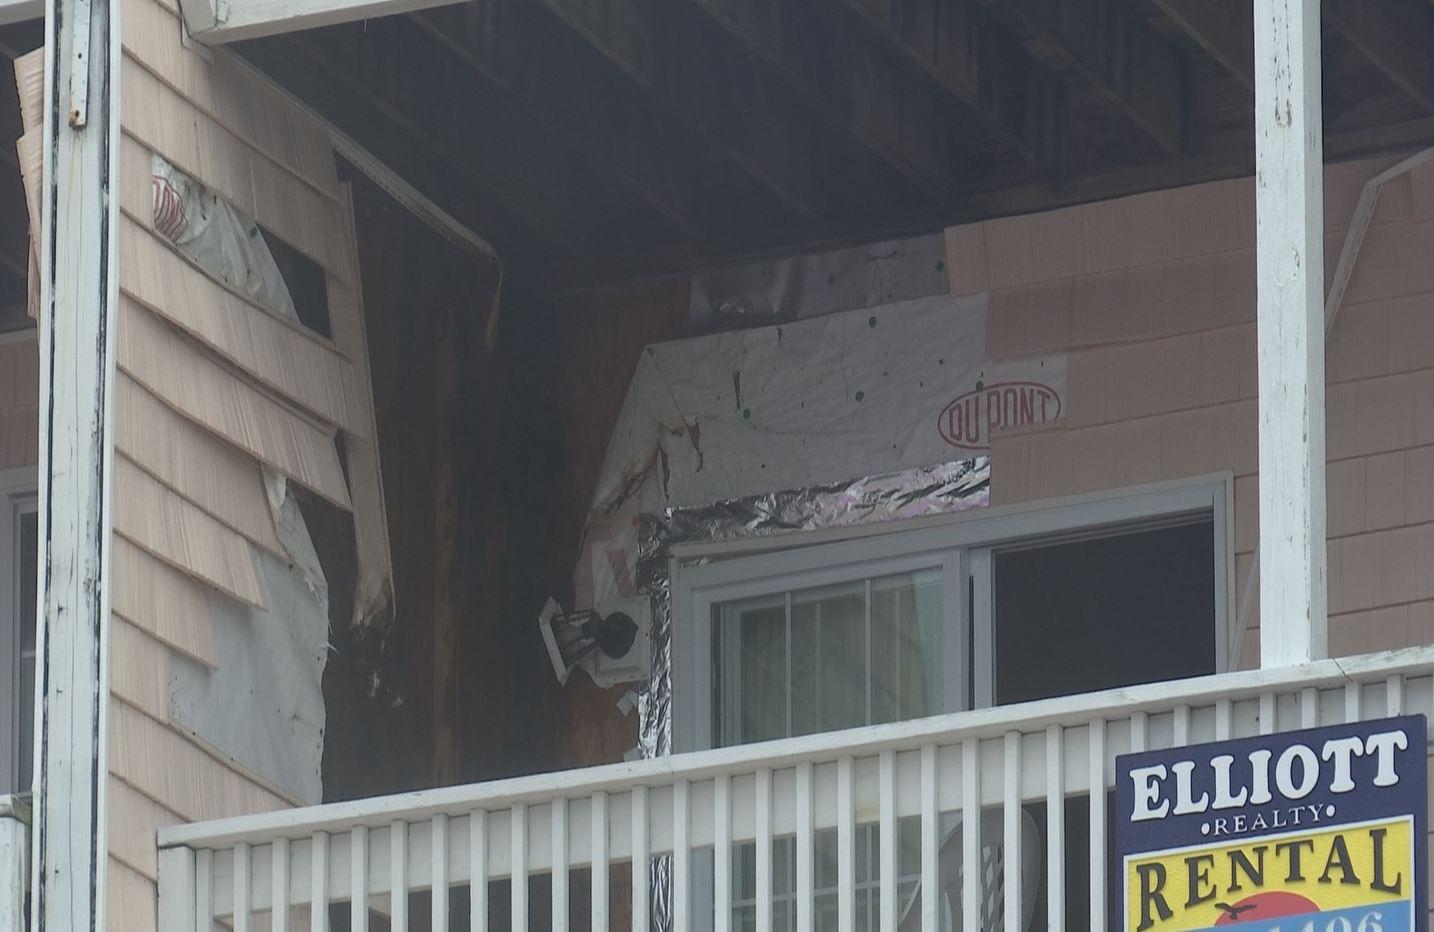 Lightning strike caused damage to North Myrtle Beach building